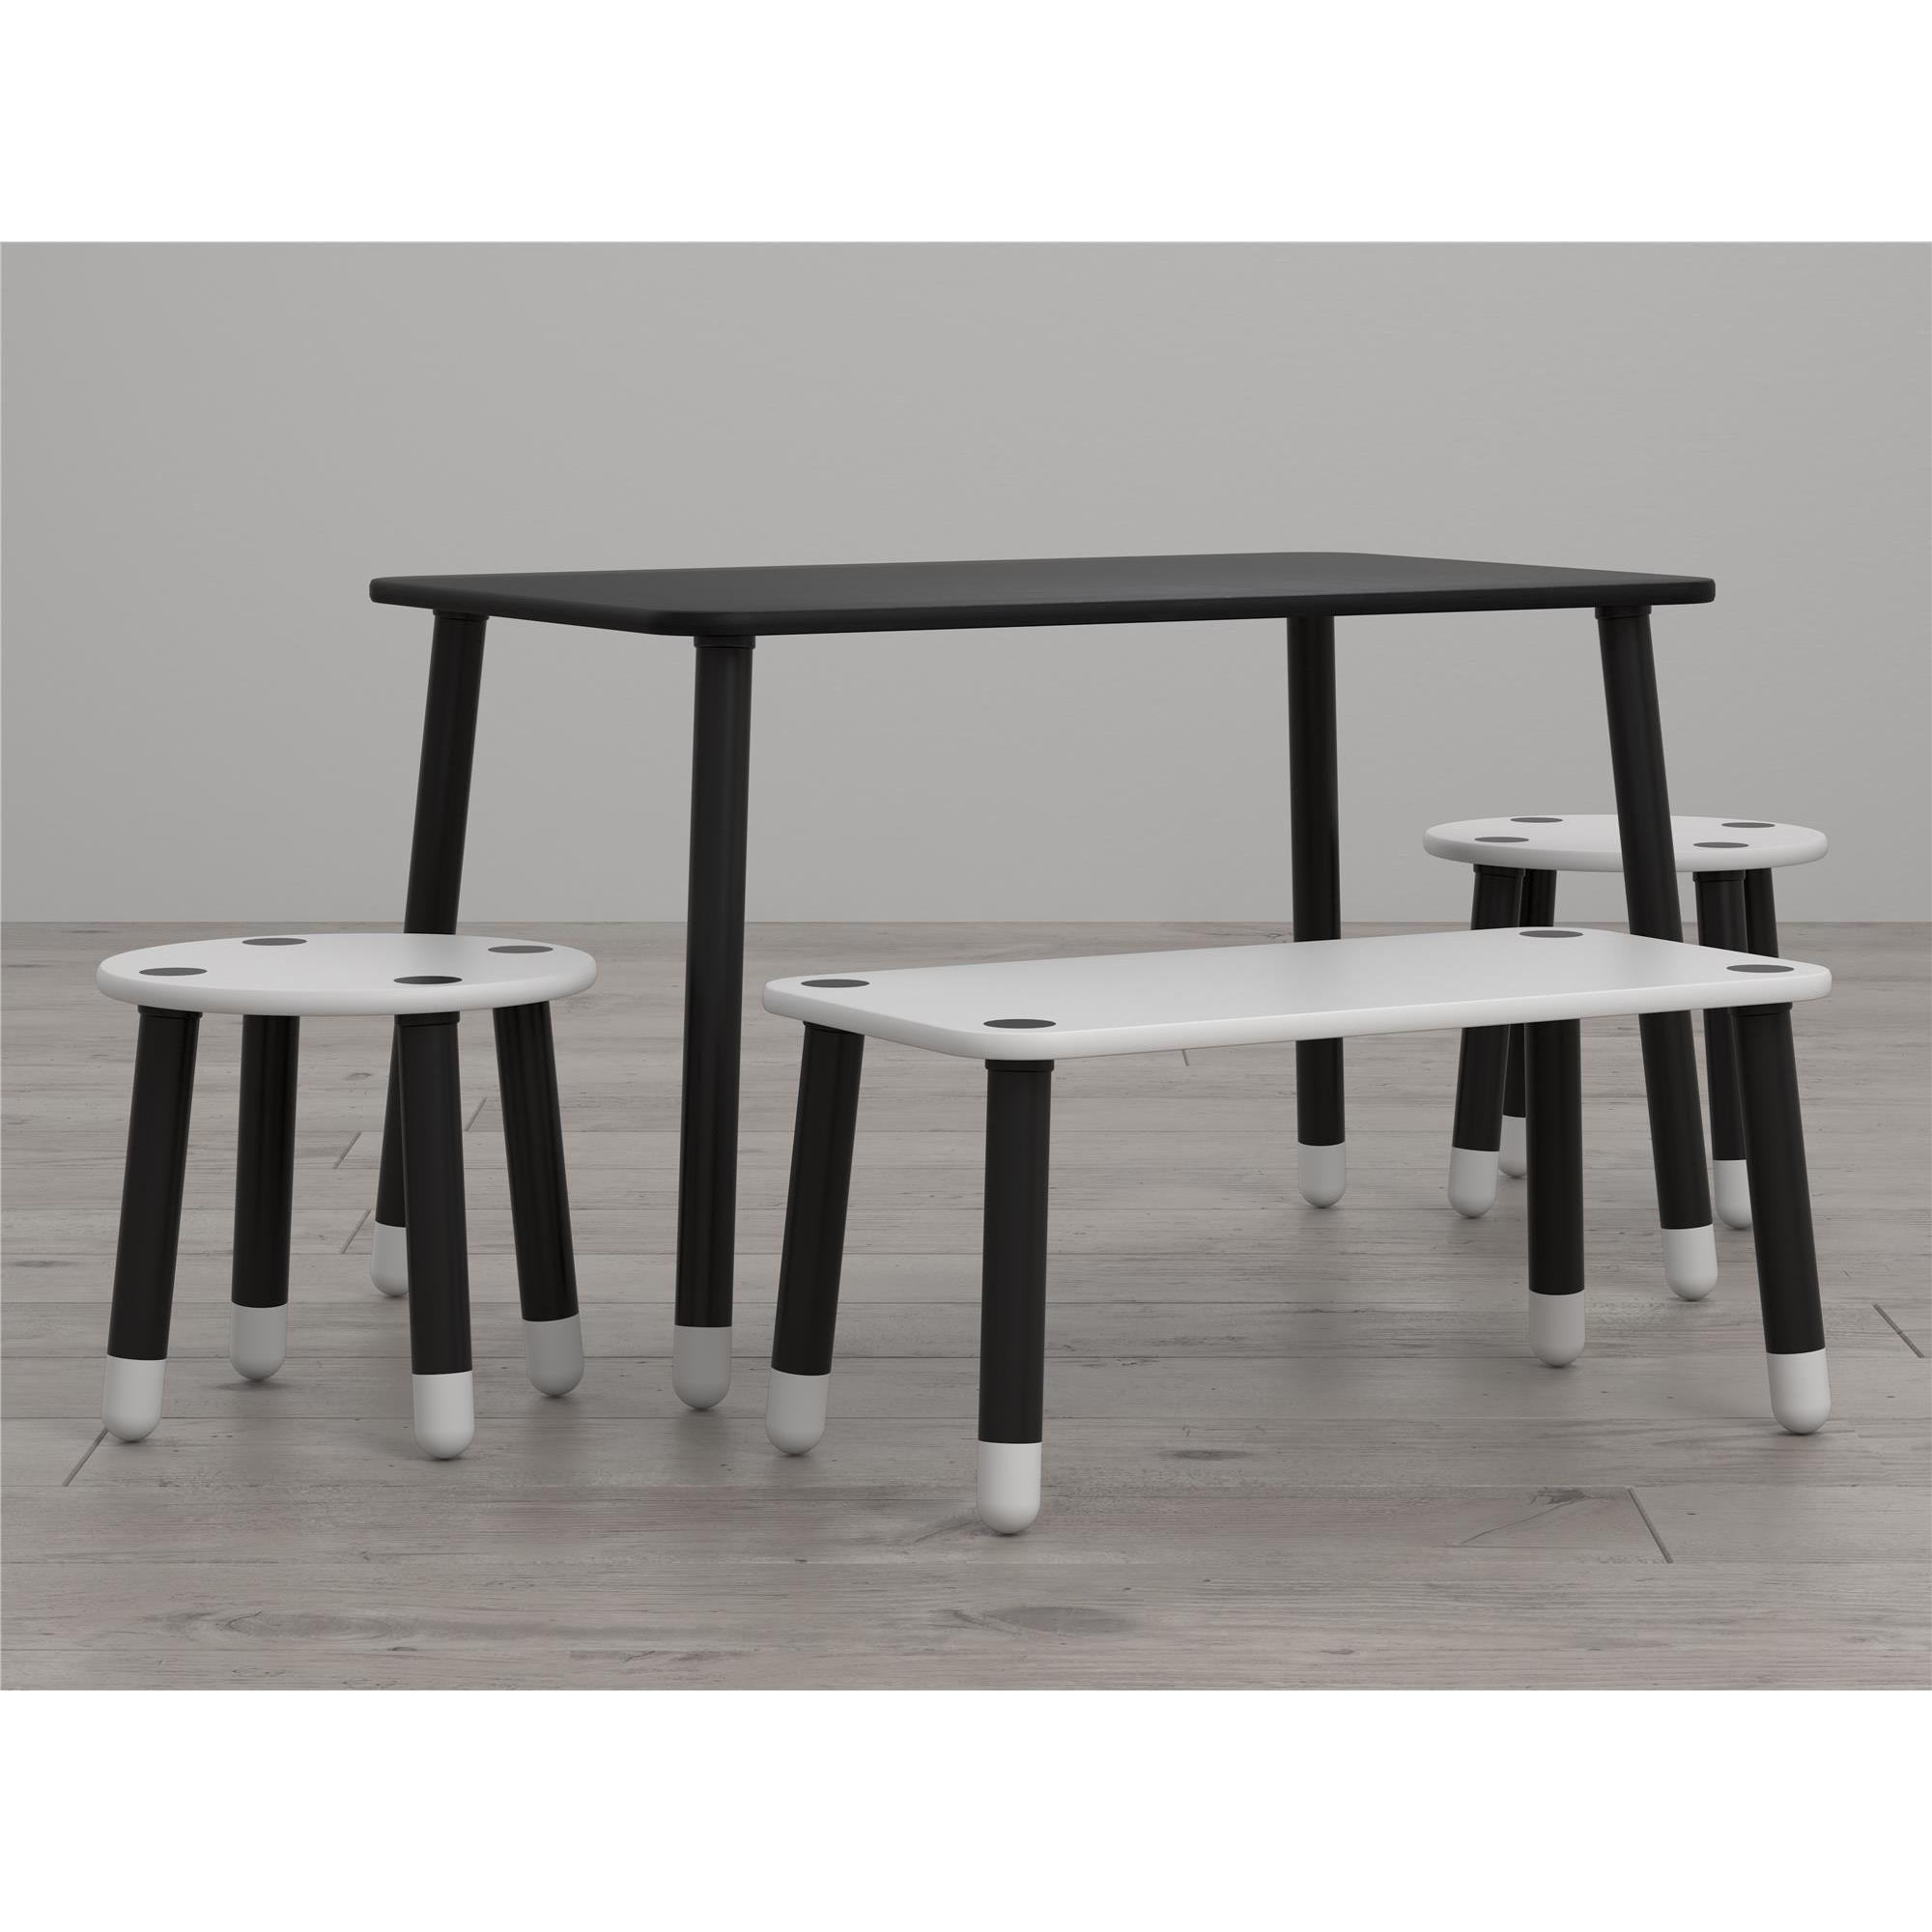 Superb Little Seeds Clover Chalkboard Top Play Table And Bench Set Creativecarmelina Interior Chair Design Creativecarmelinacom